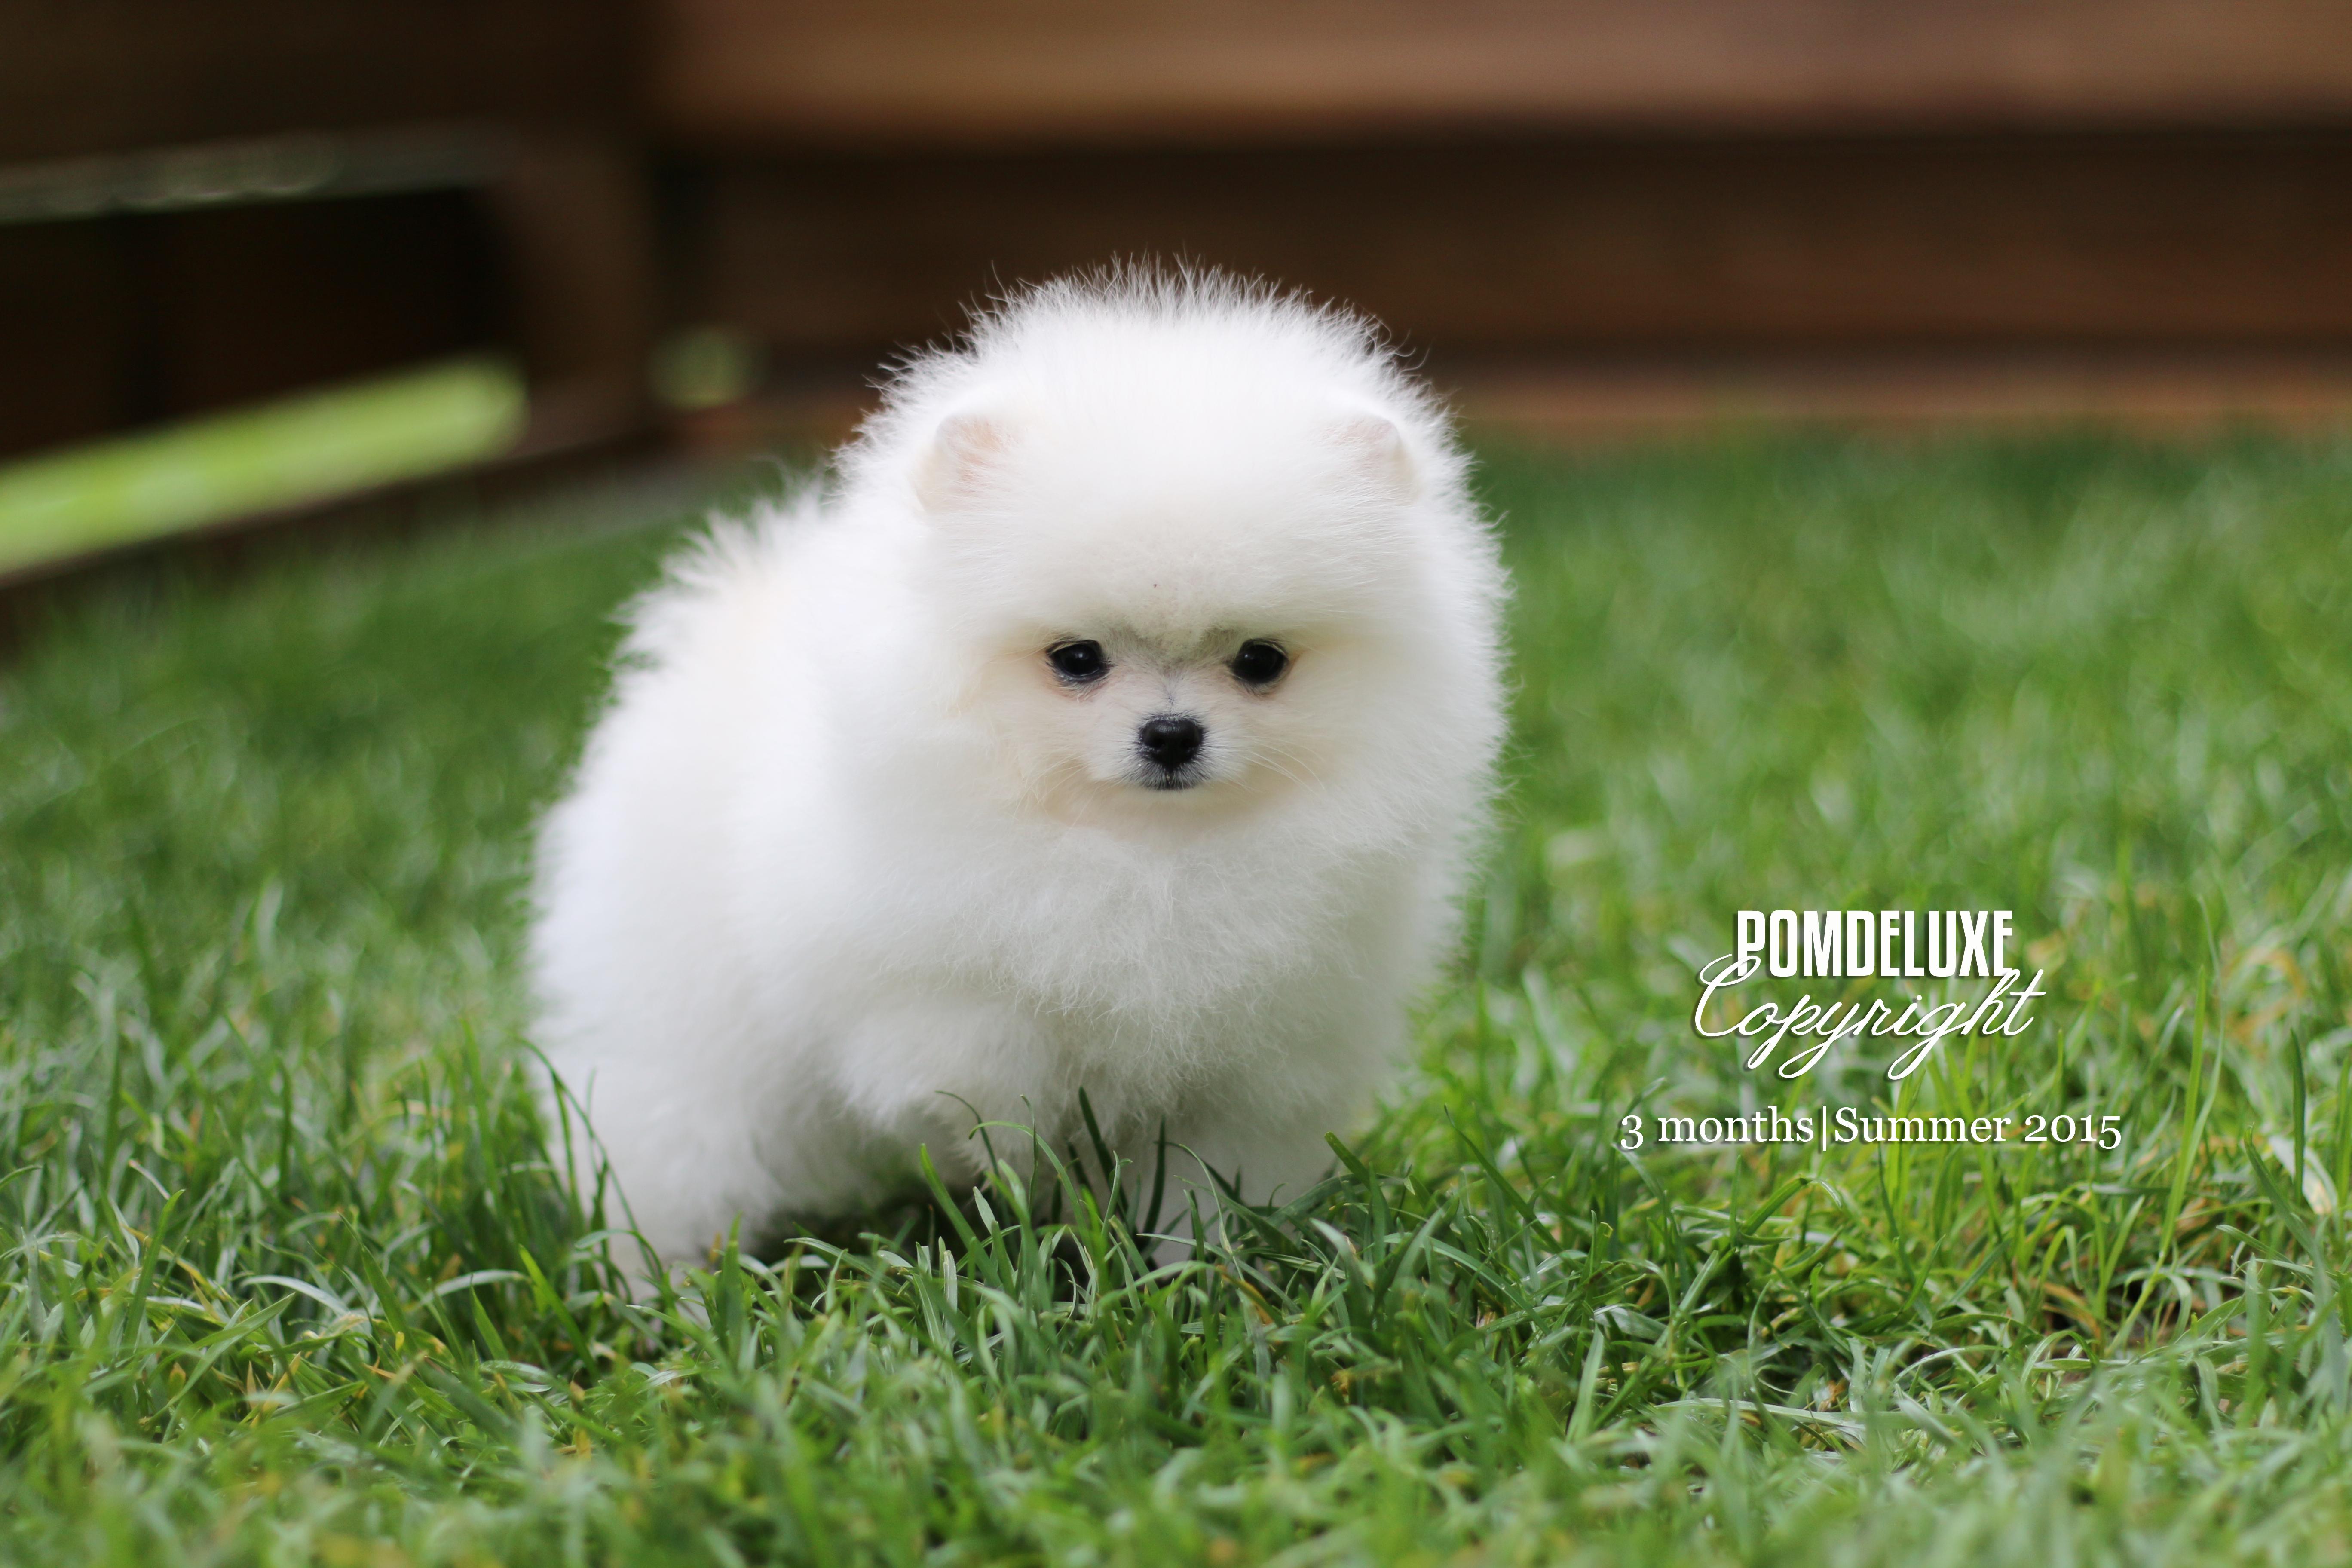 December 2013 Pomdeluxe Pomeranians